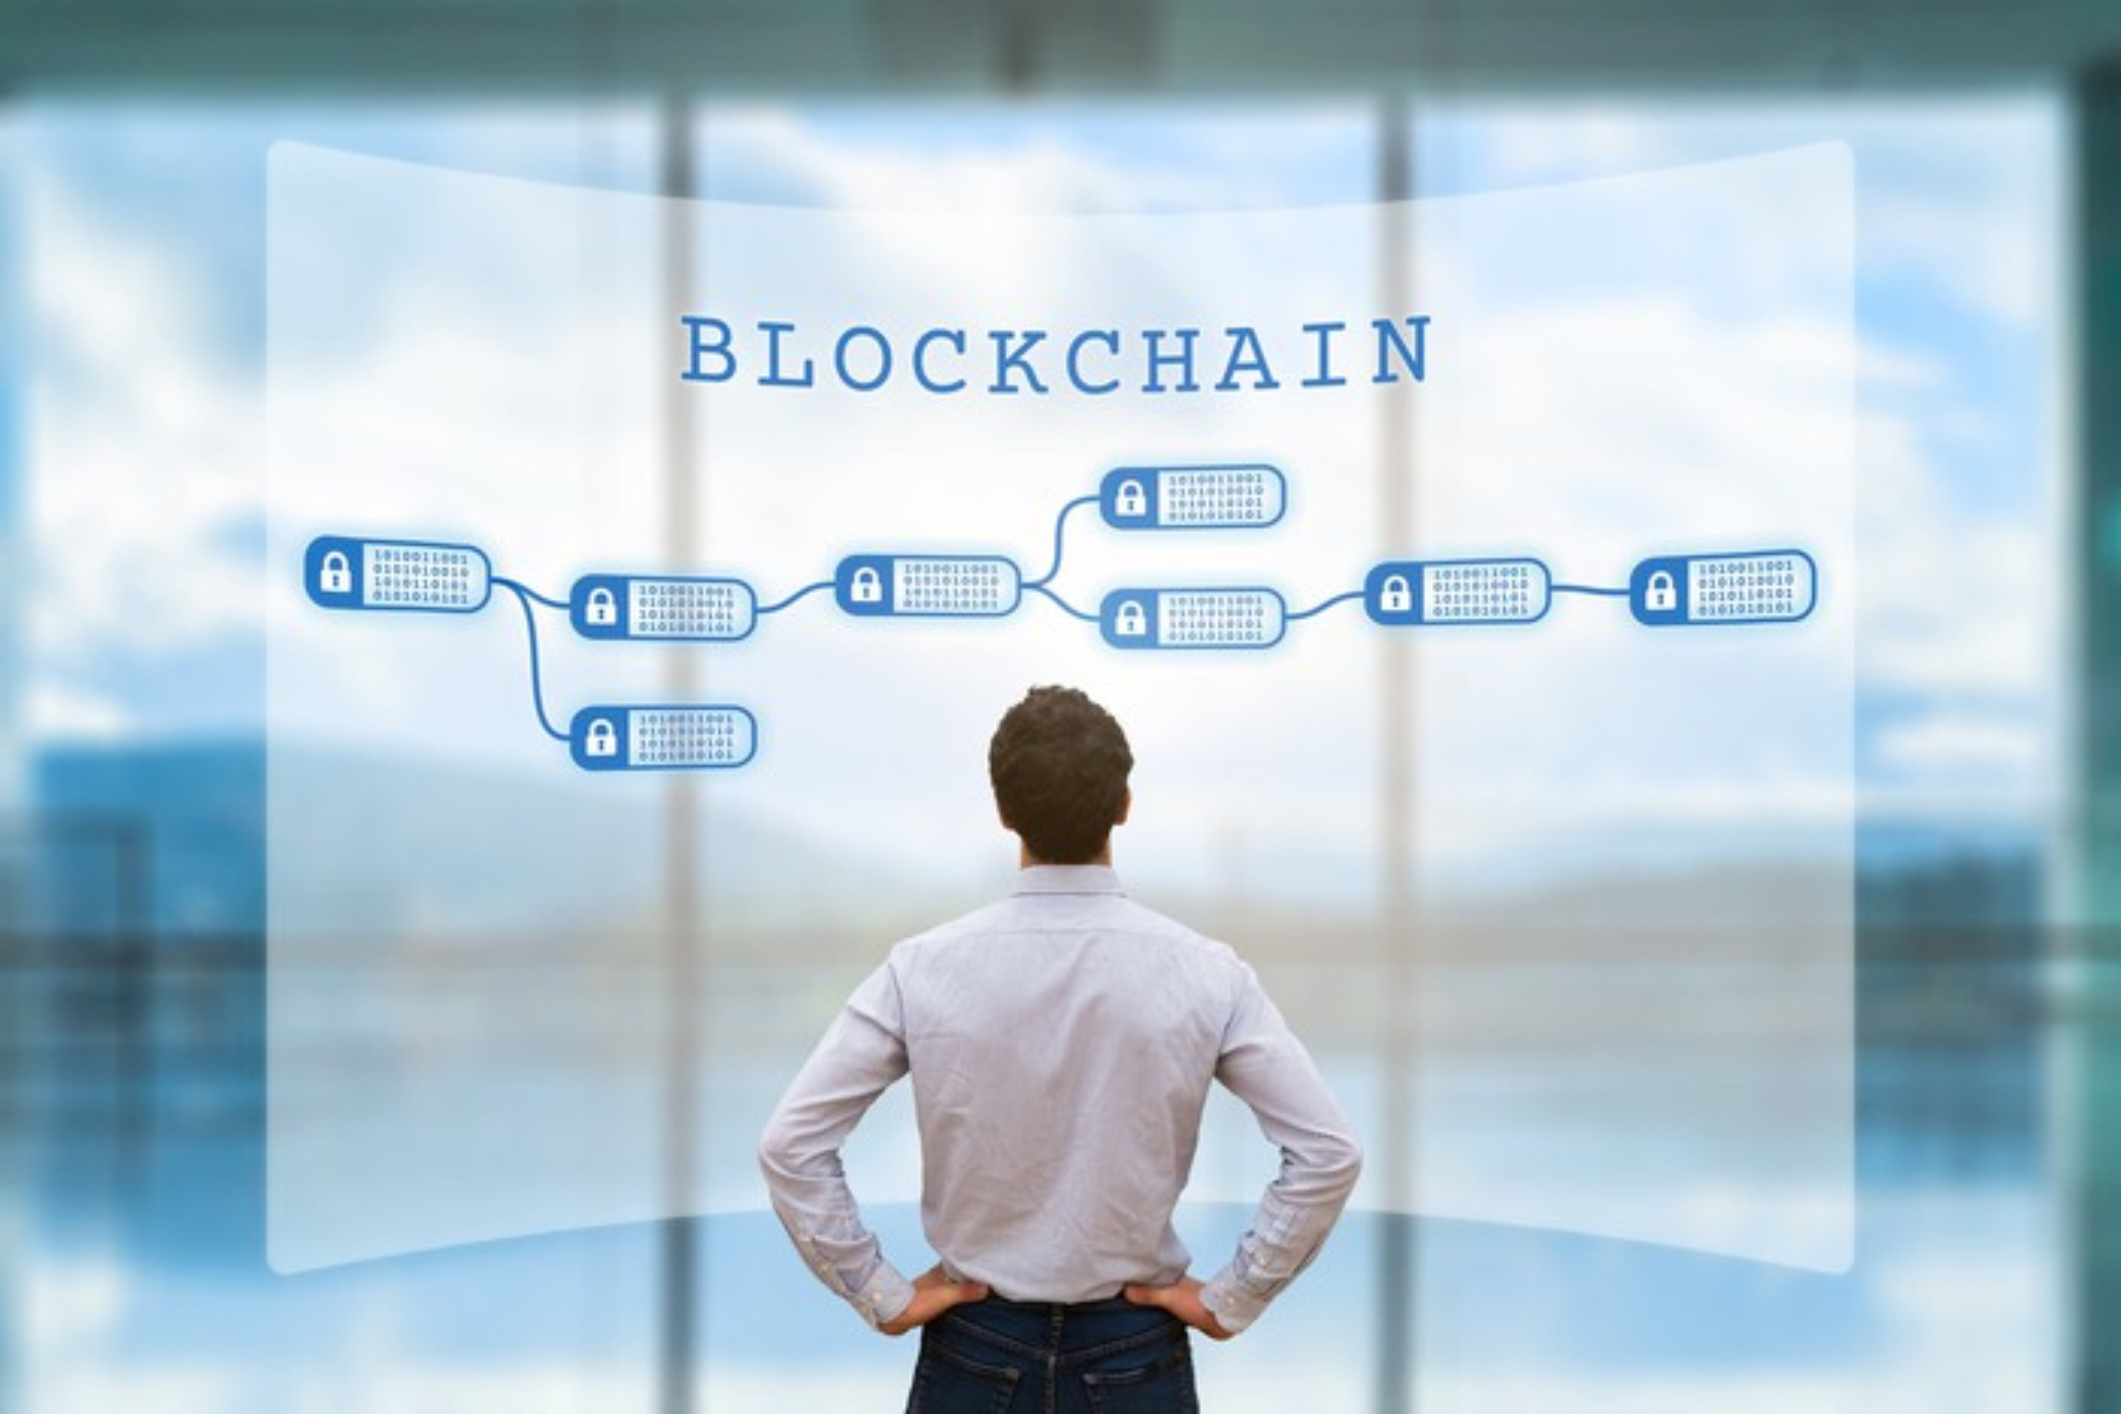 A businessman examining an encrypted blockchain on a digital screen.